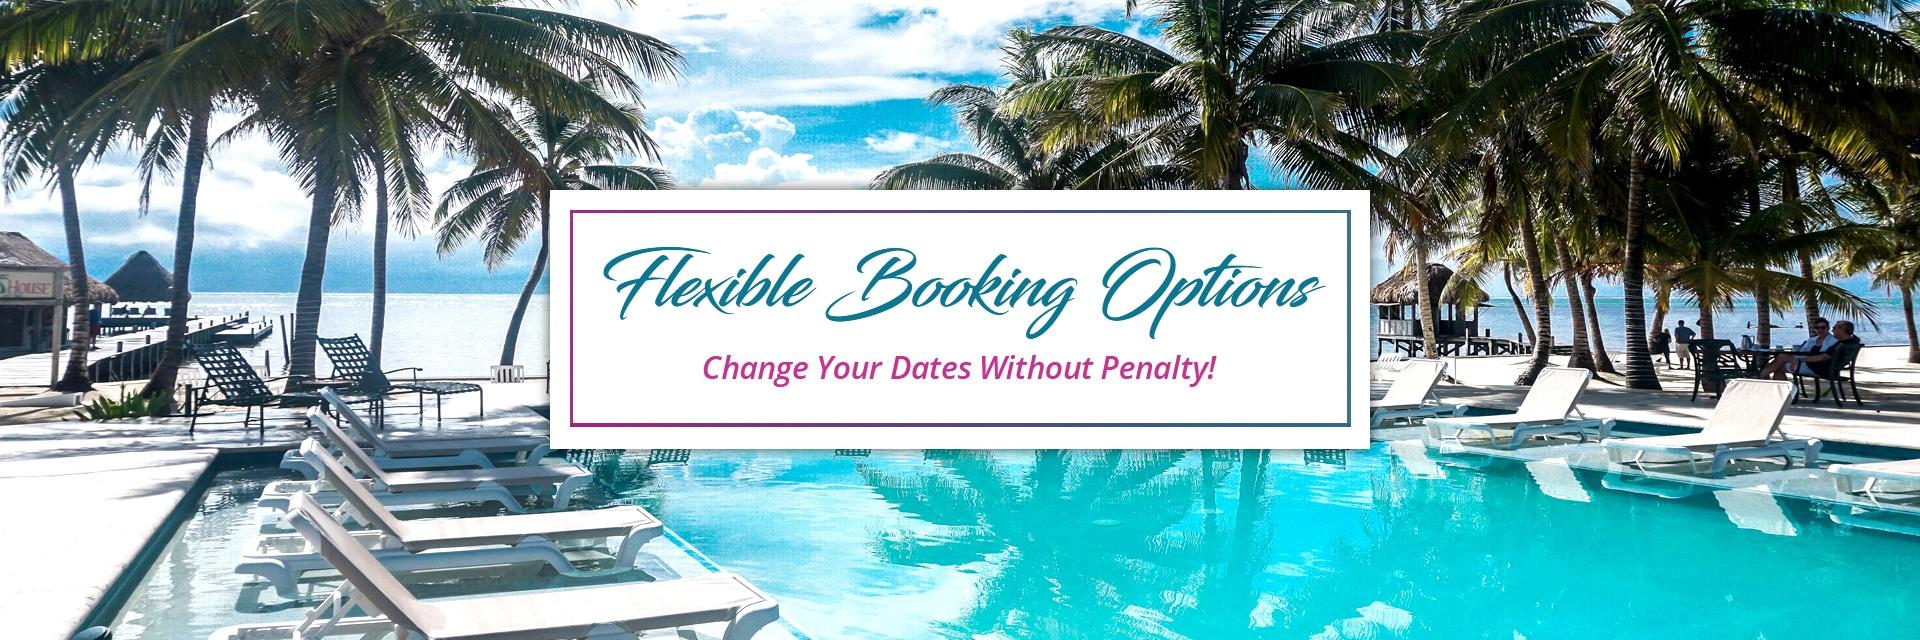 Victoria house flexible booking